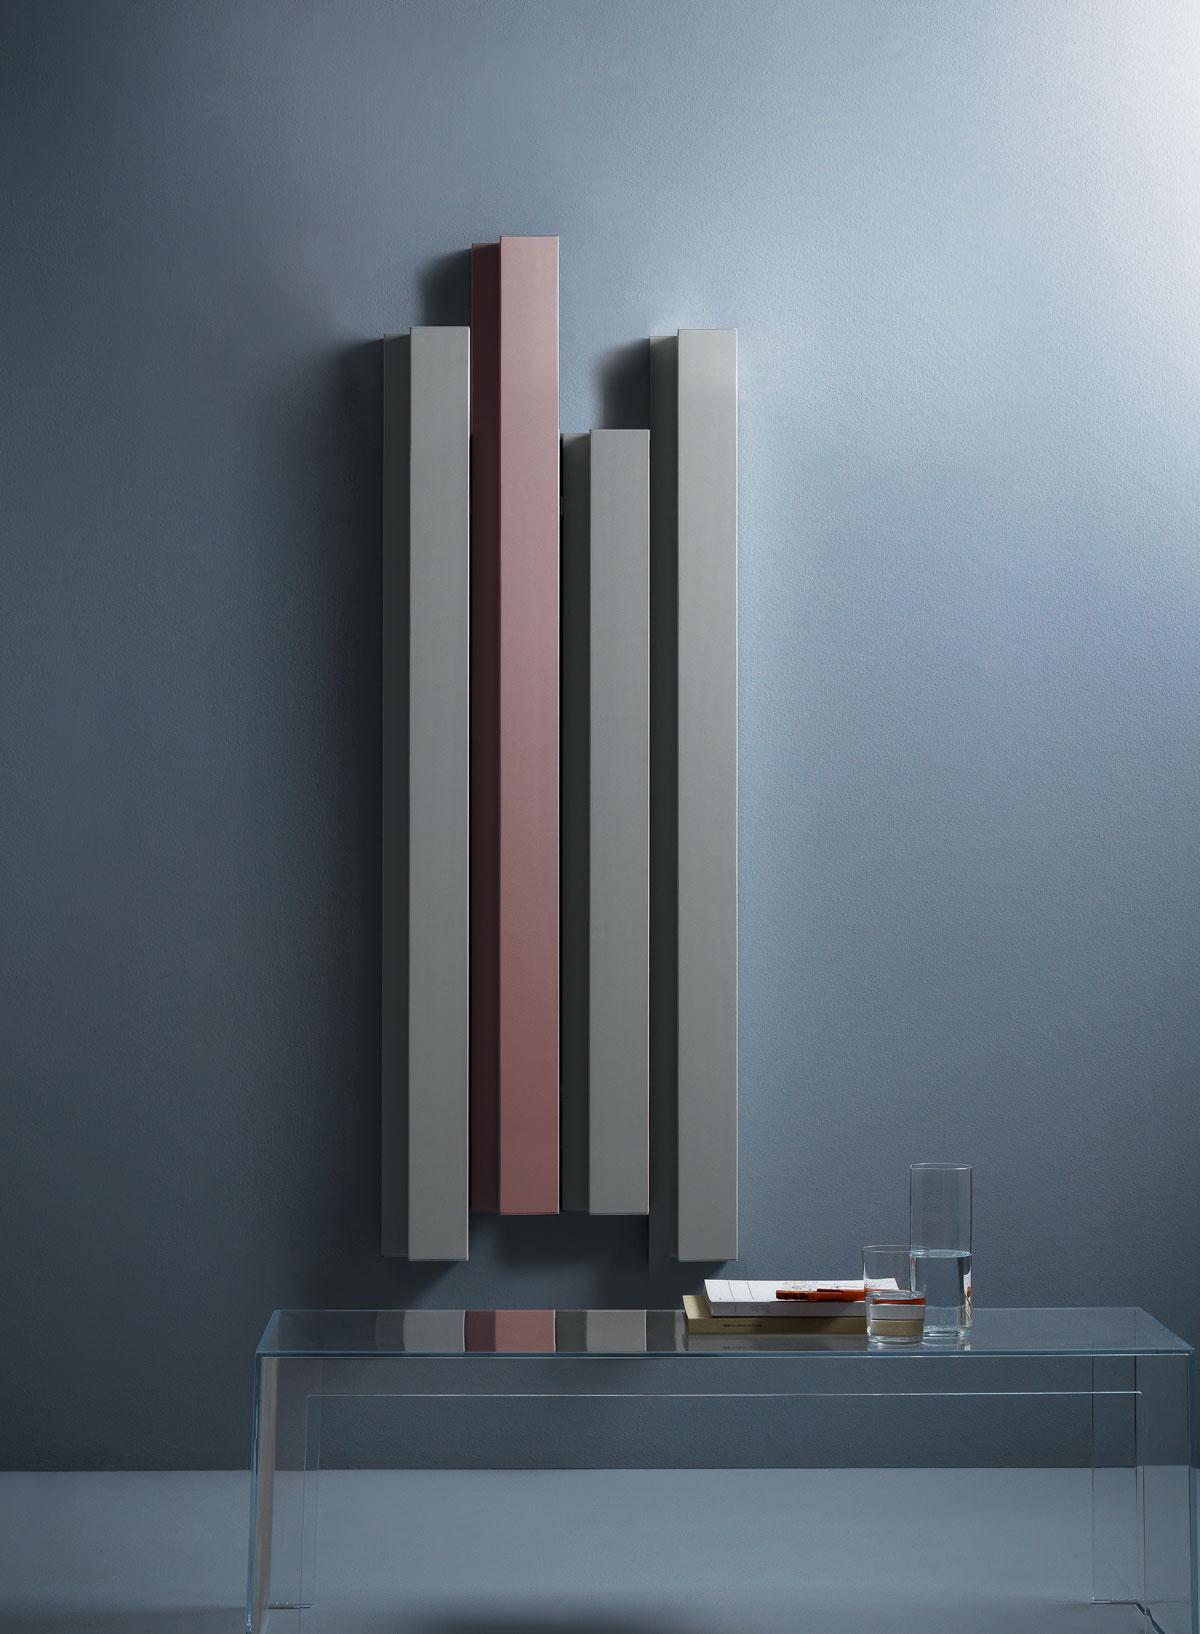 Nobili Rubinetteria : Elements i radiatori design di tubes